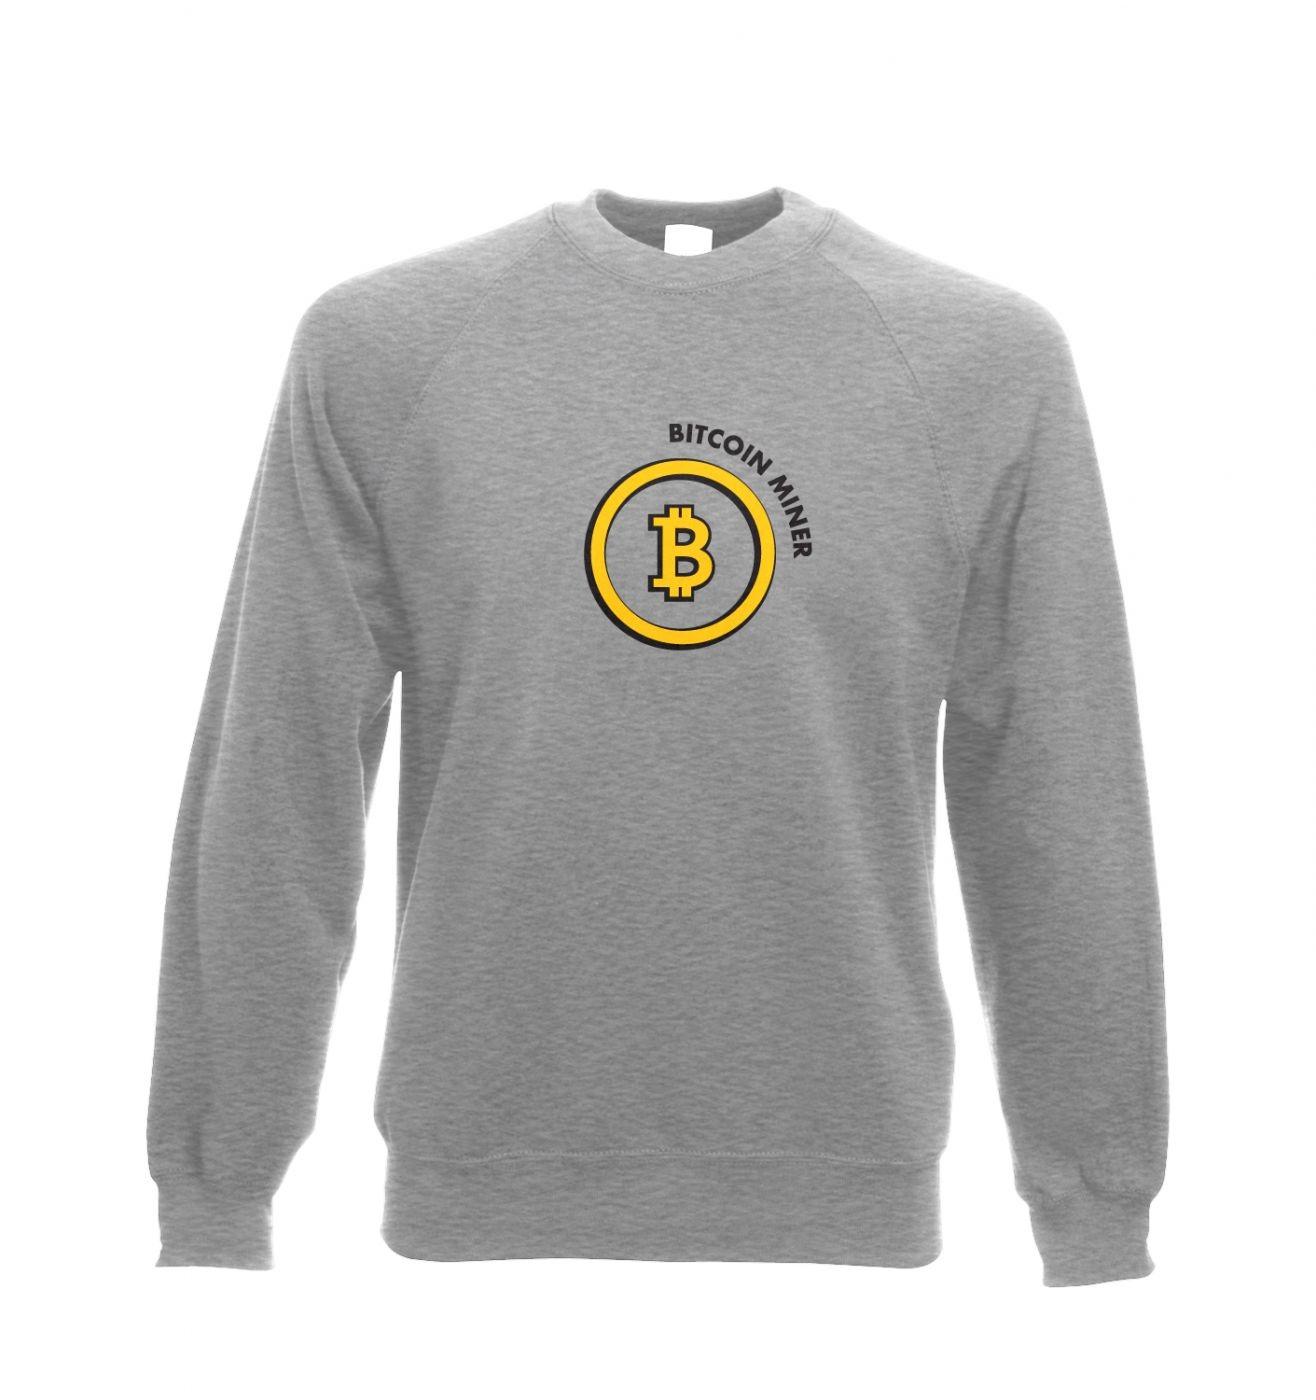 Bitcoin Miner Adult Crewneck Sweatshirt